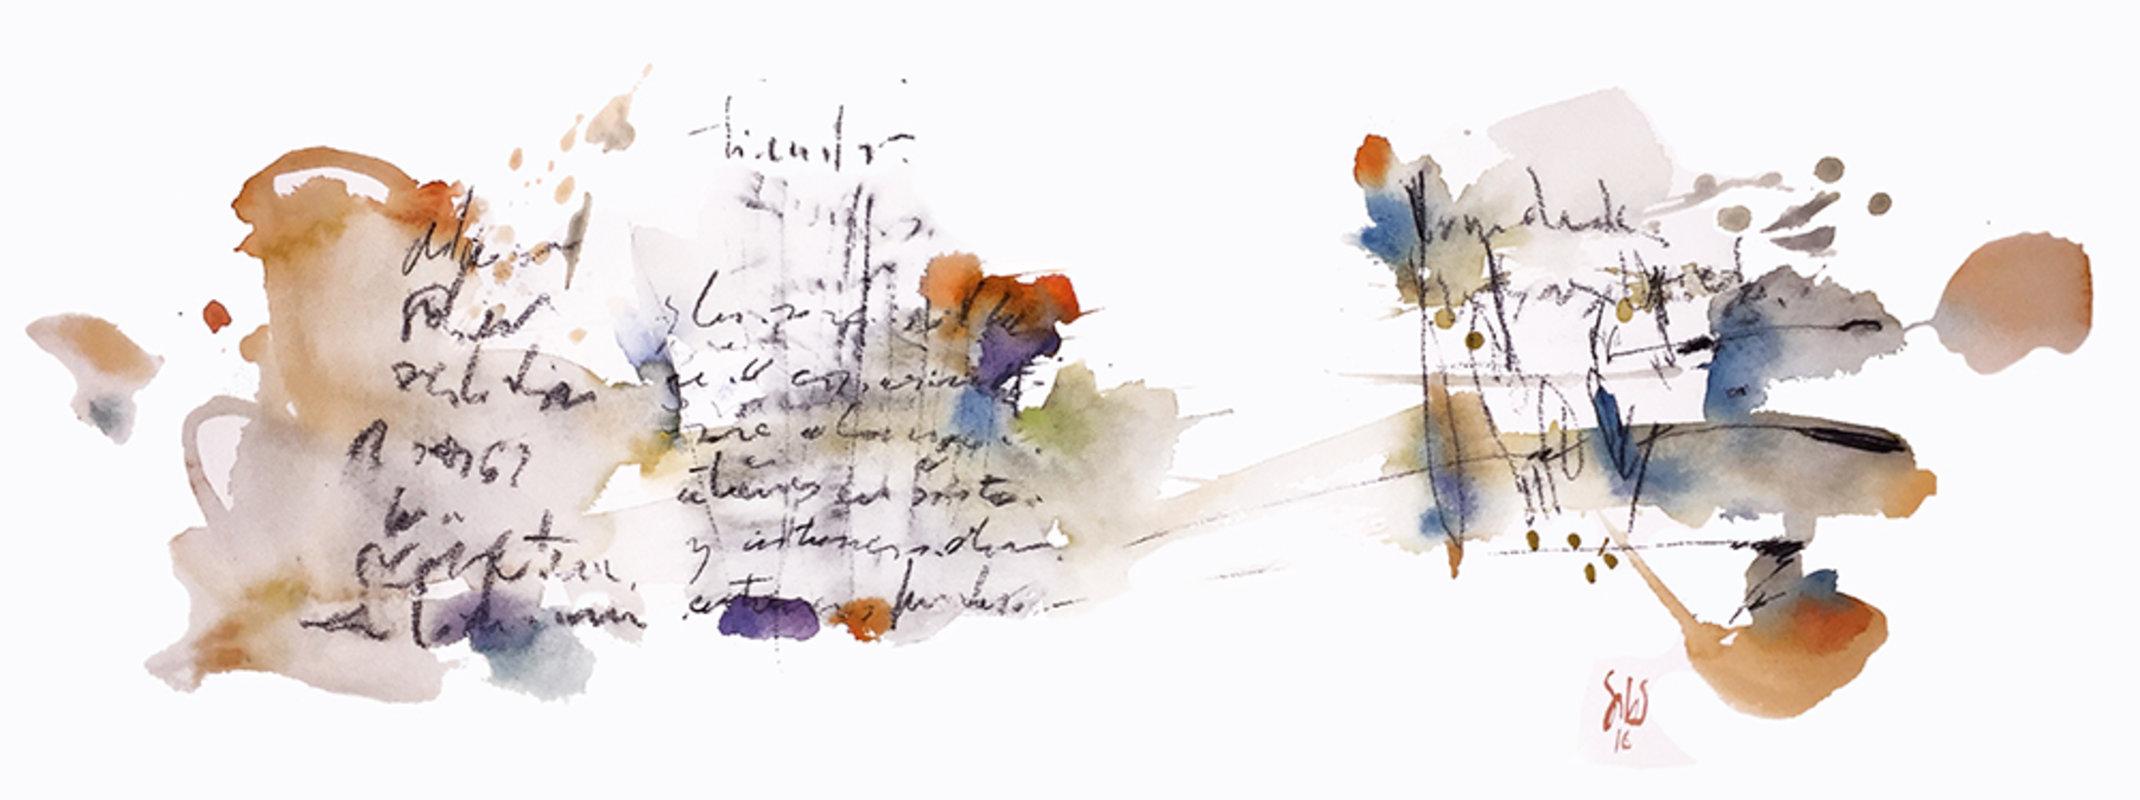 Arte chileno / Mensaje escrito | Salas Francisco